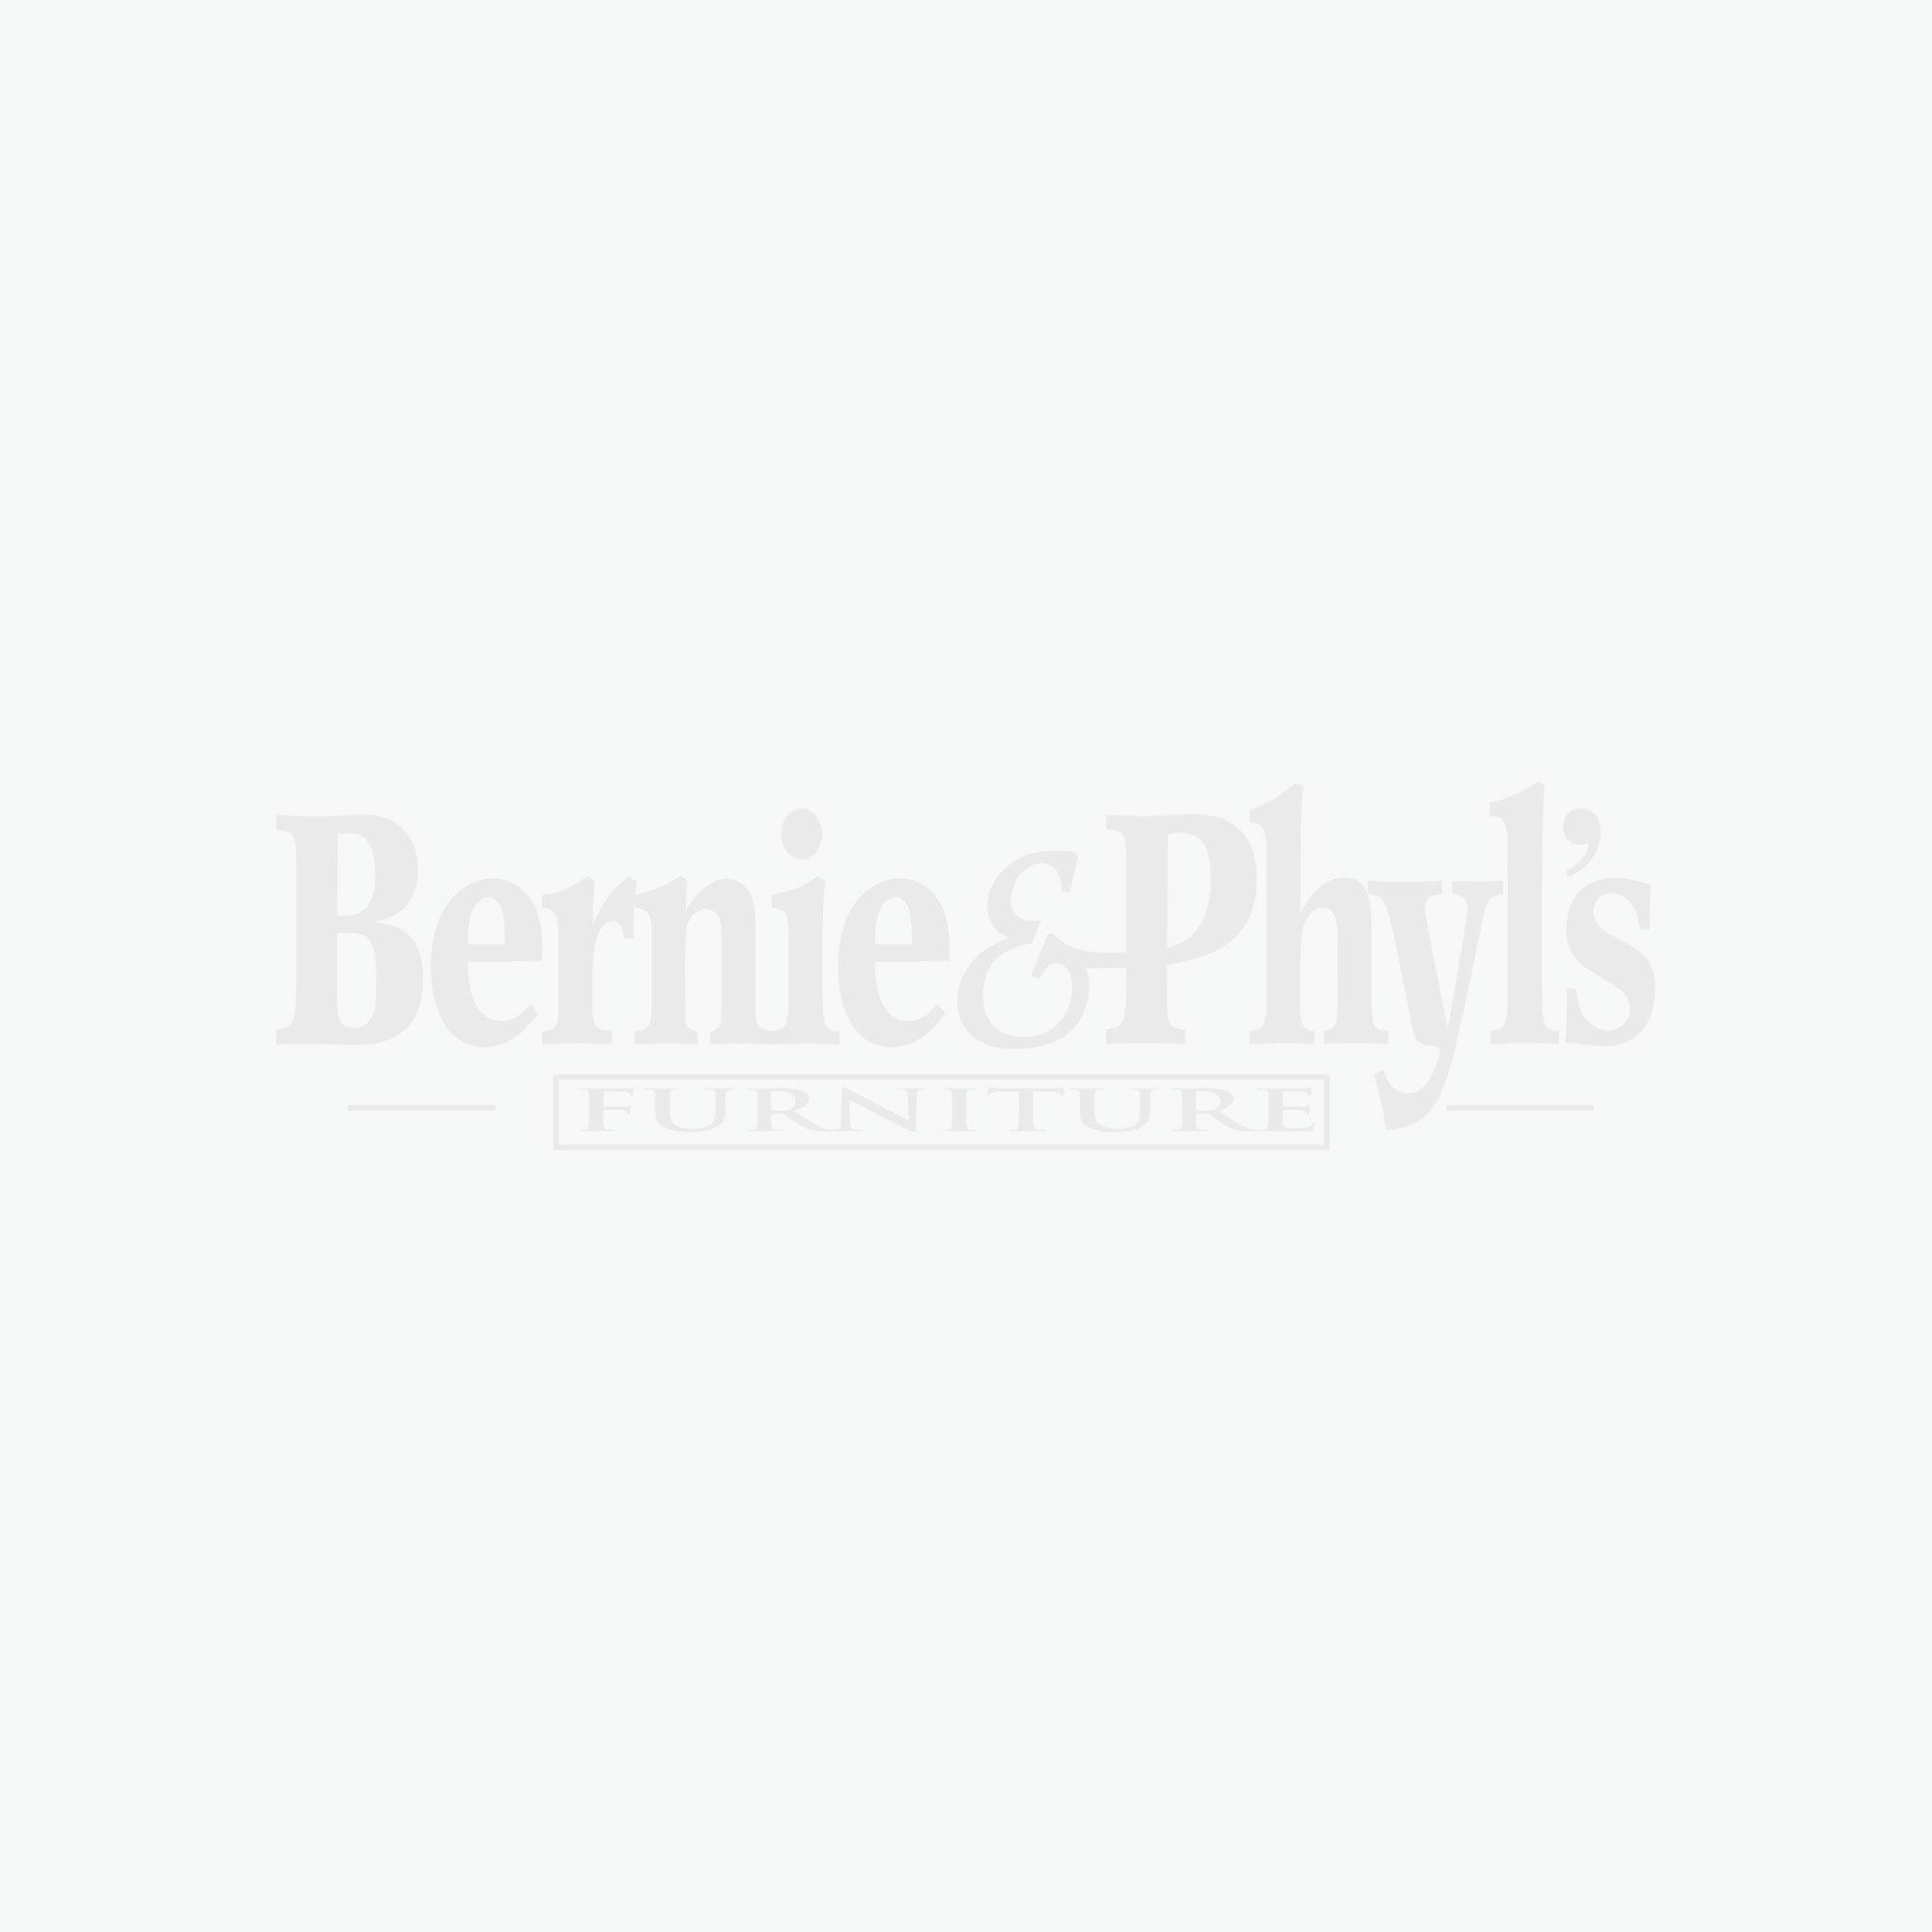 Ashley Furniture Cary Nc: Bernie & Phyl's Furniture